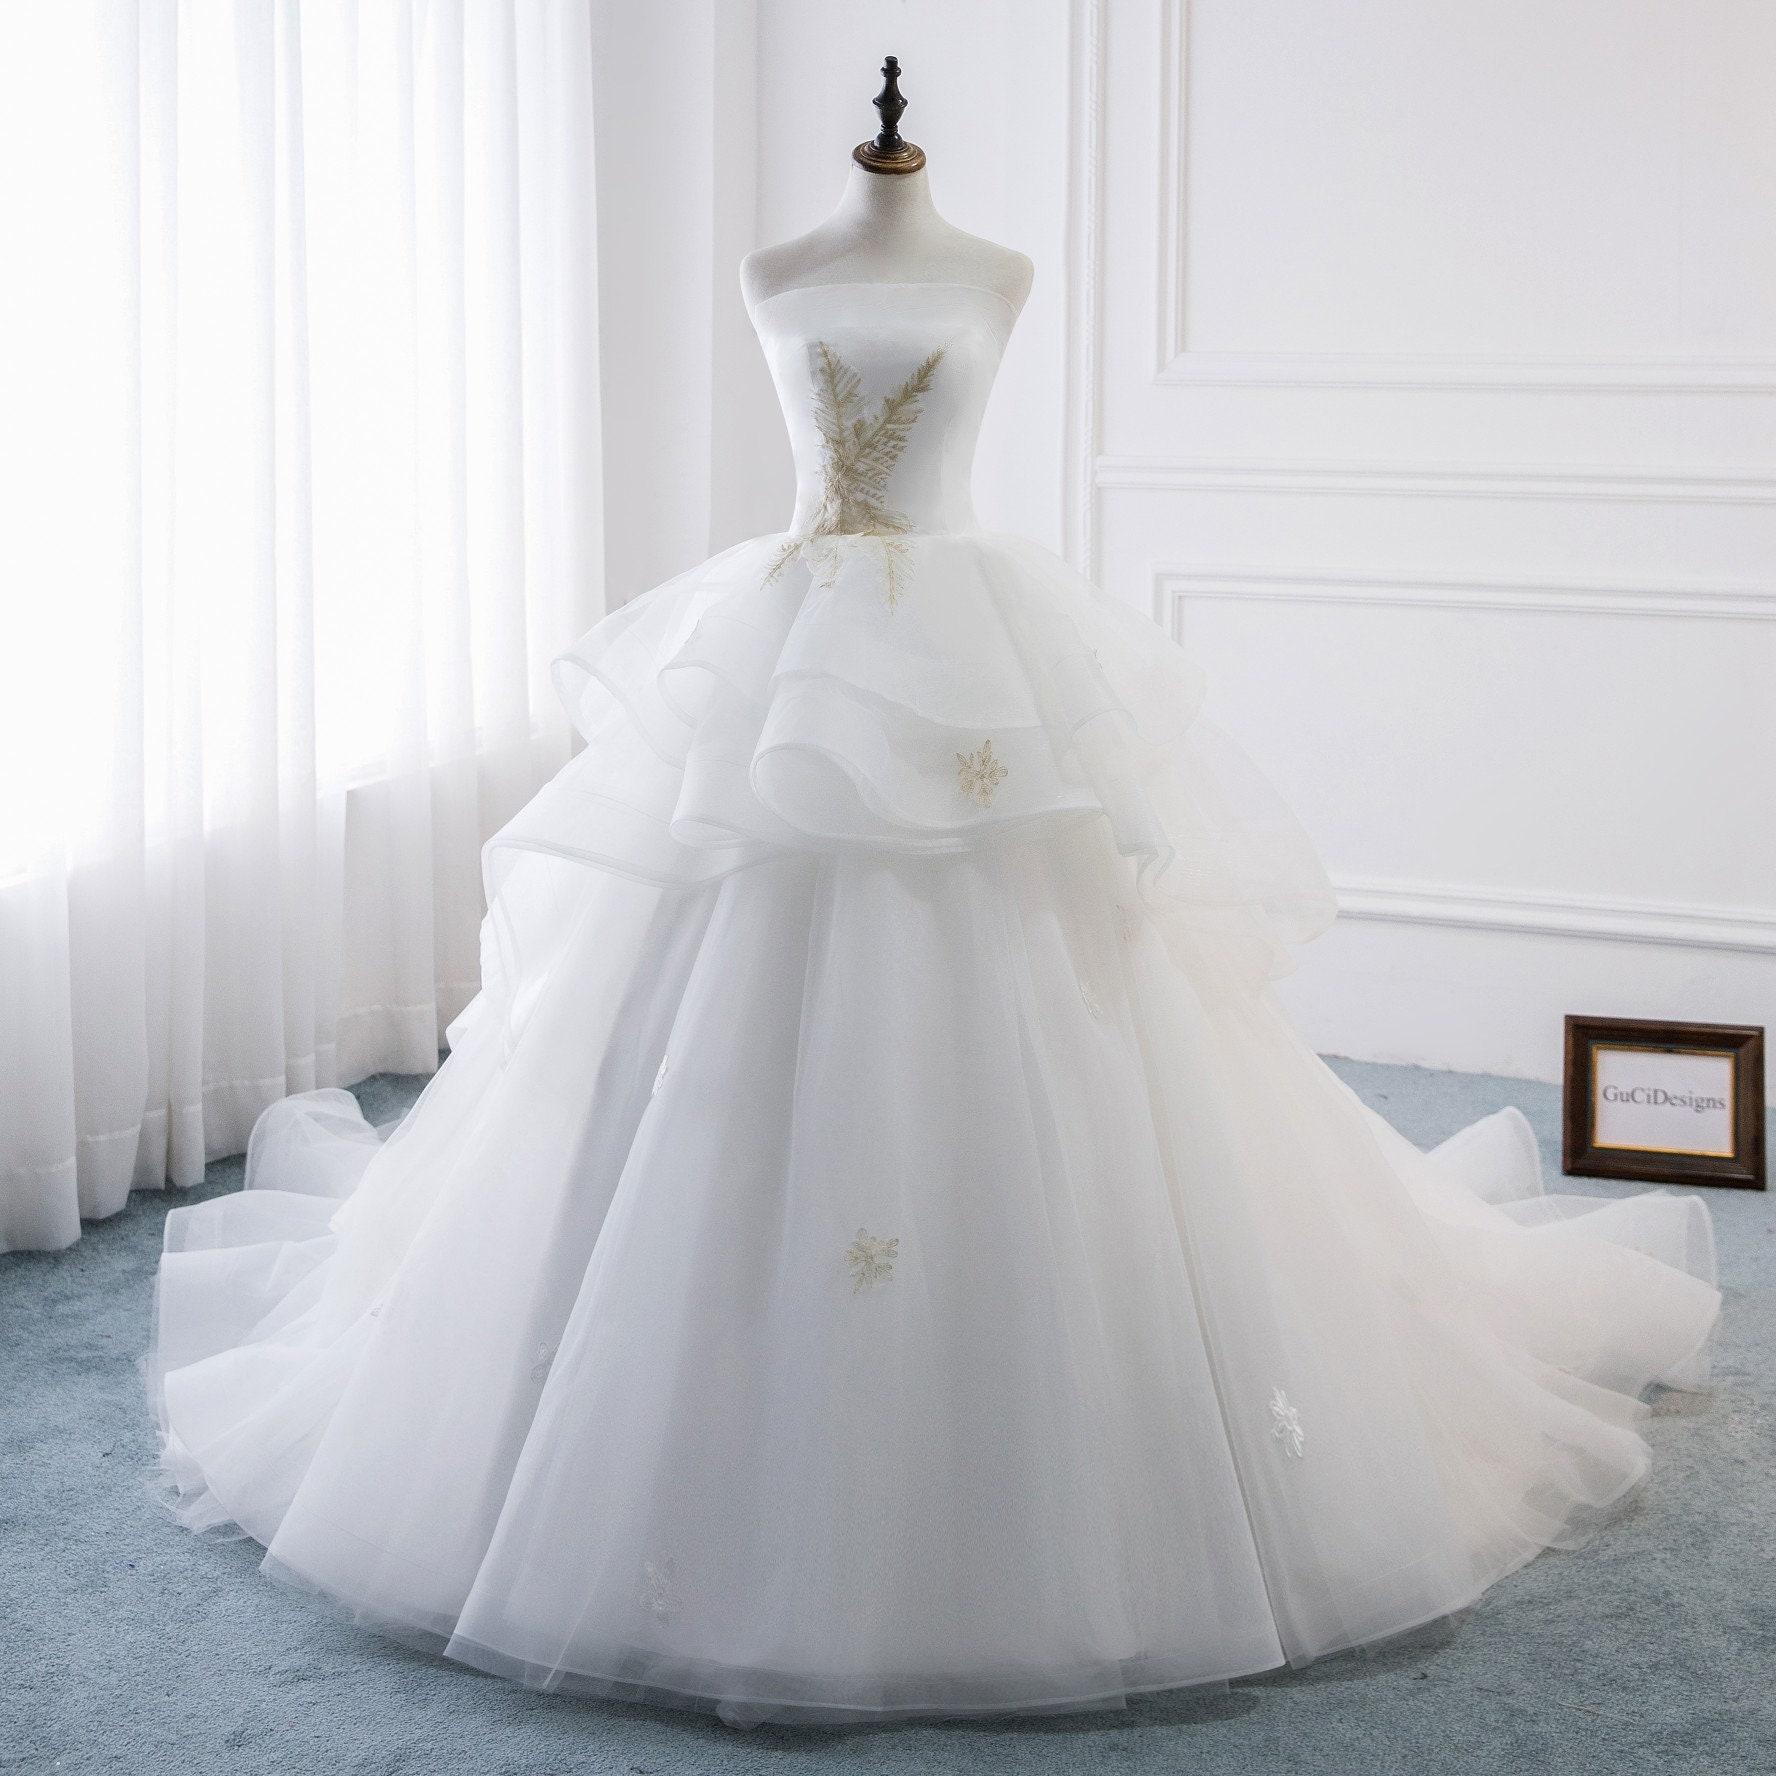 20 Romantic A line Royal Wedding Dresses White Bridal Gown Gold Lace  wedding dresses Boho wedding Gown Custom Bride Dress Long Train